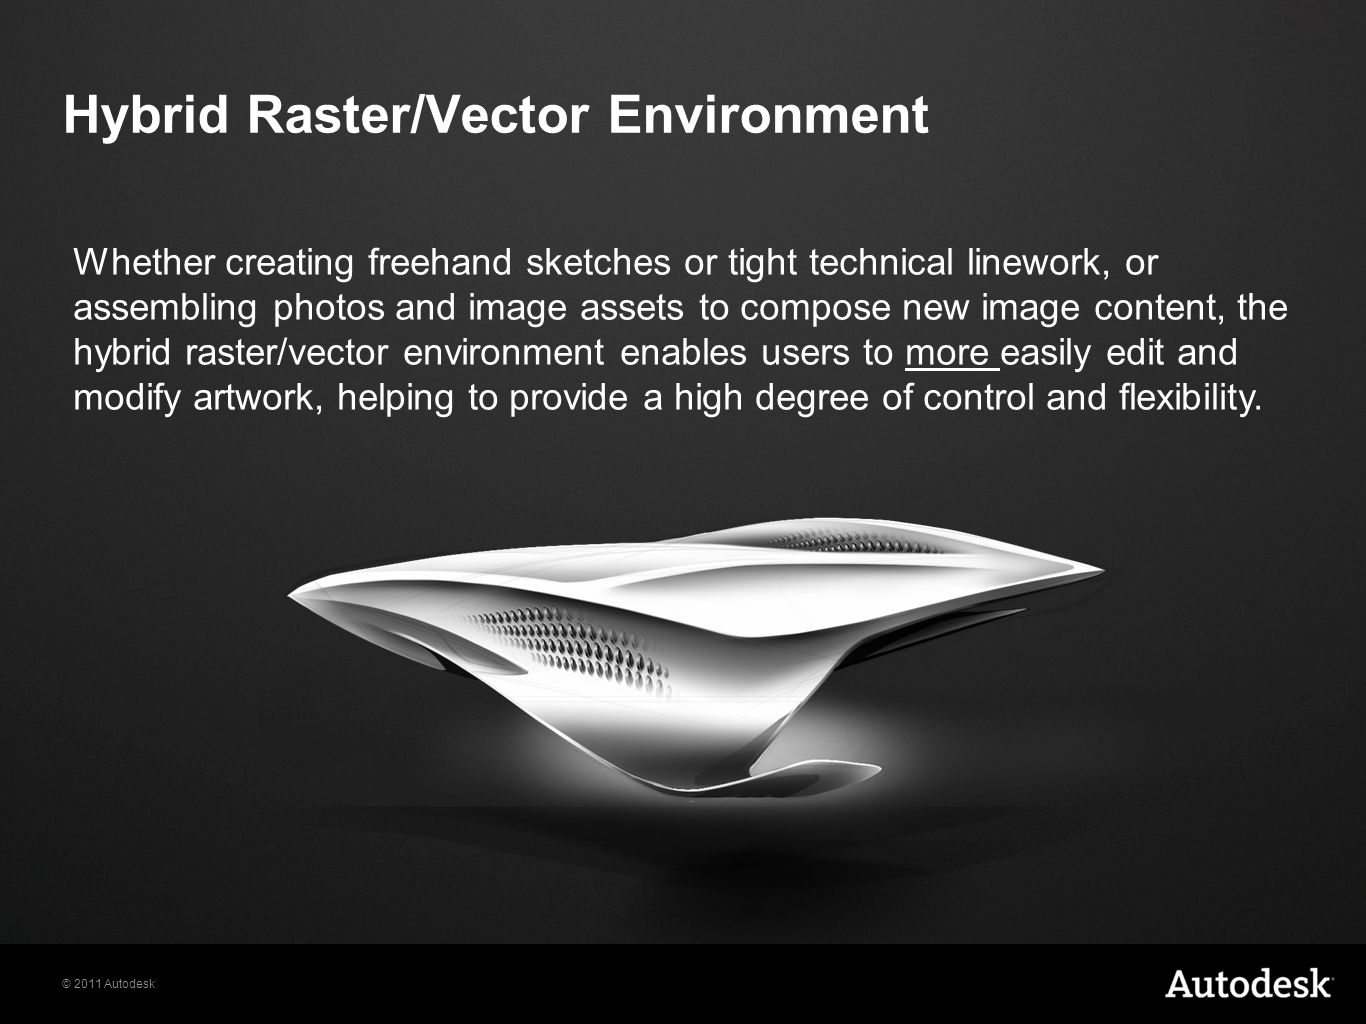 Hybrid Raster/Vector Environment